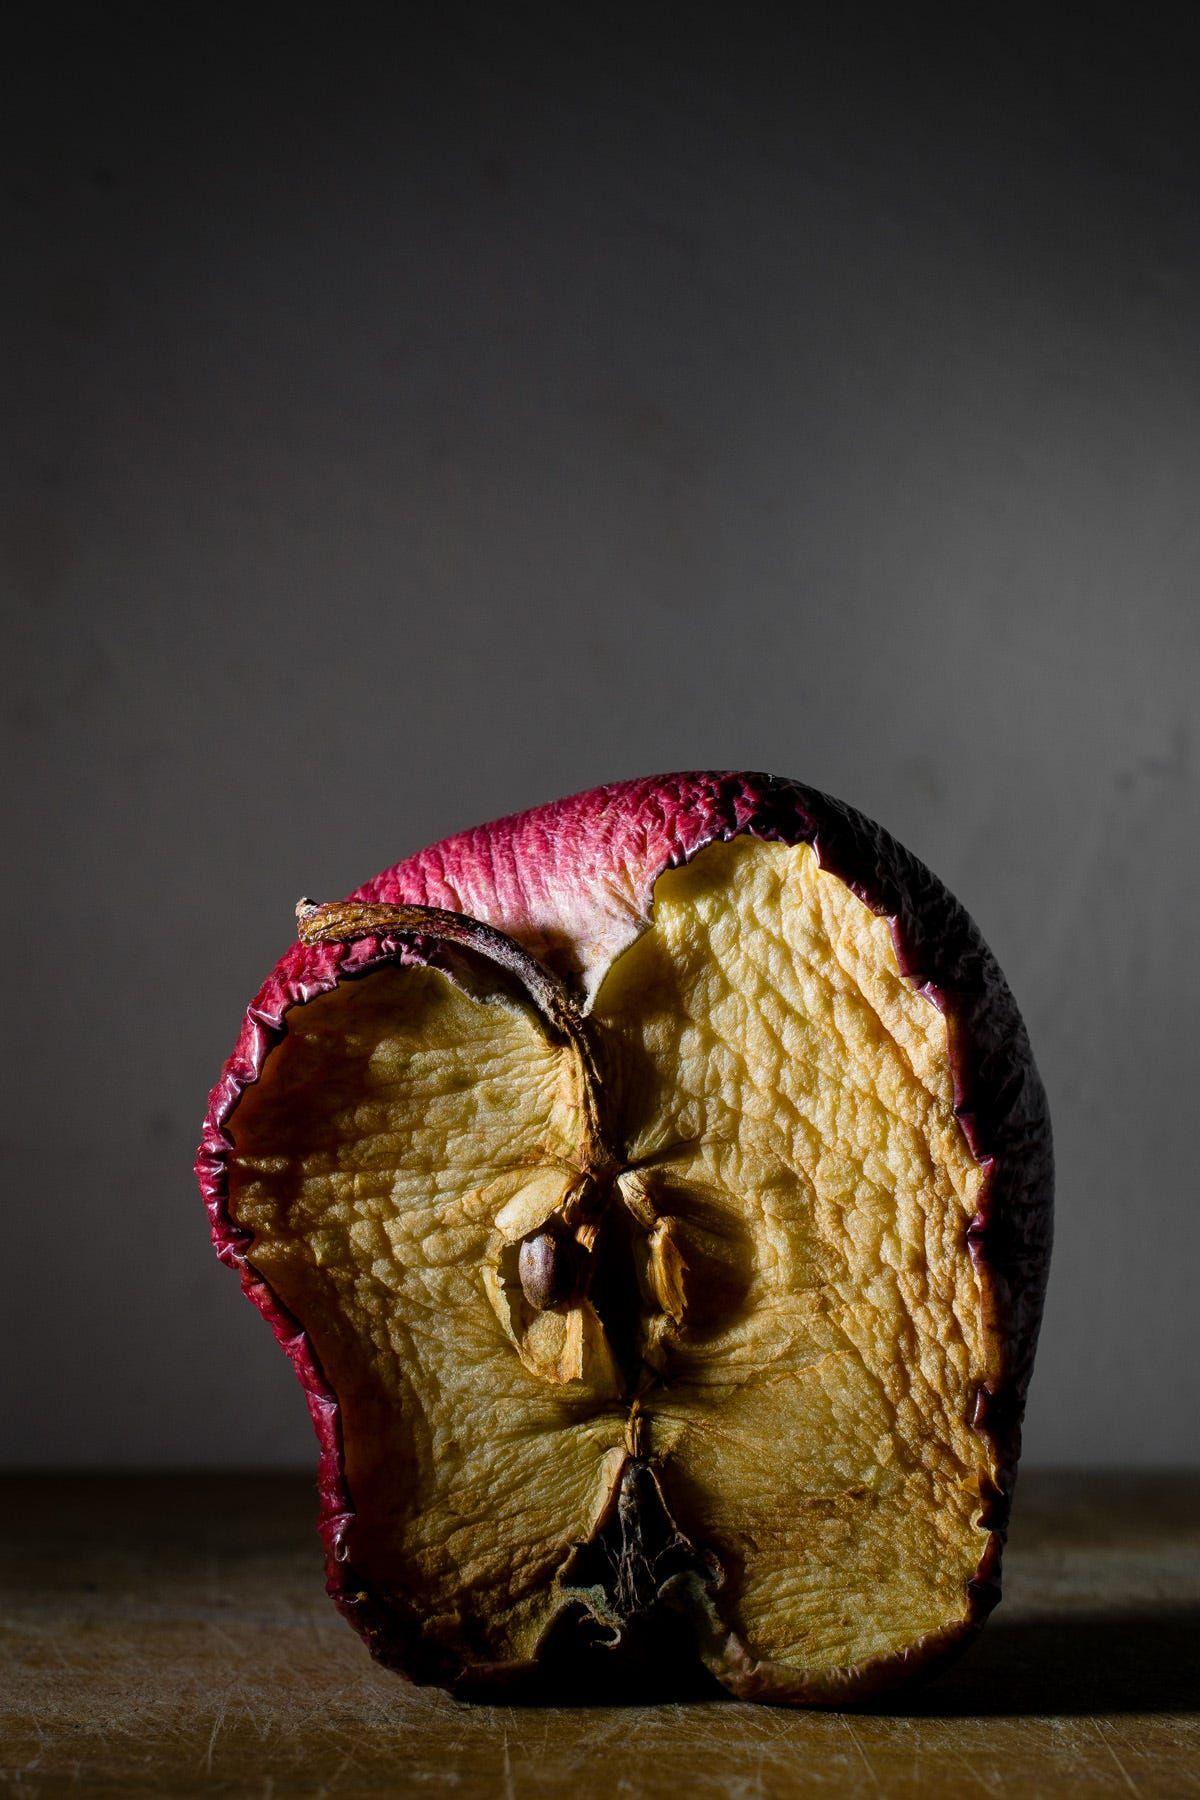 Overripe Apple / Manzana podrida by Omar Mora / 50